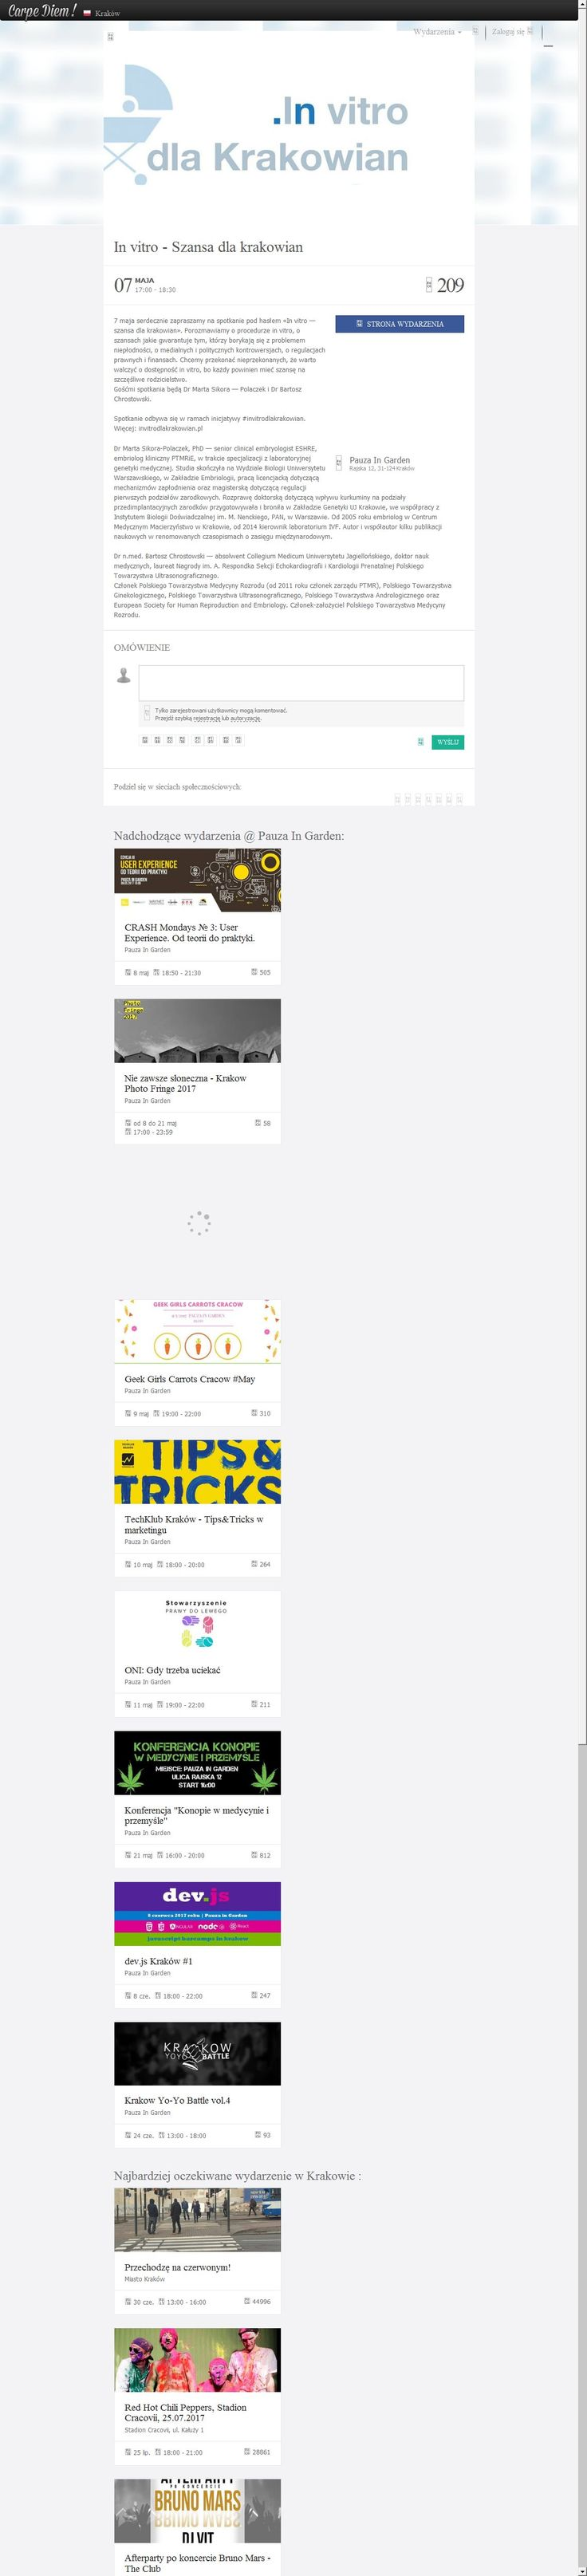 http://nencki.inforia.net/przeglad.php?mode=podglad